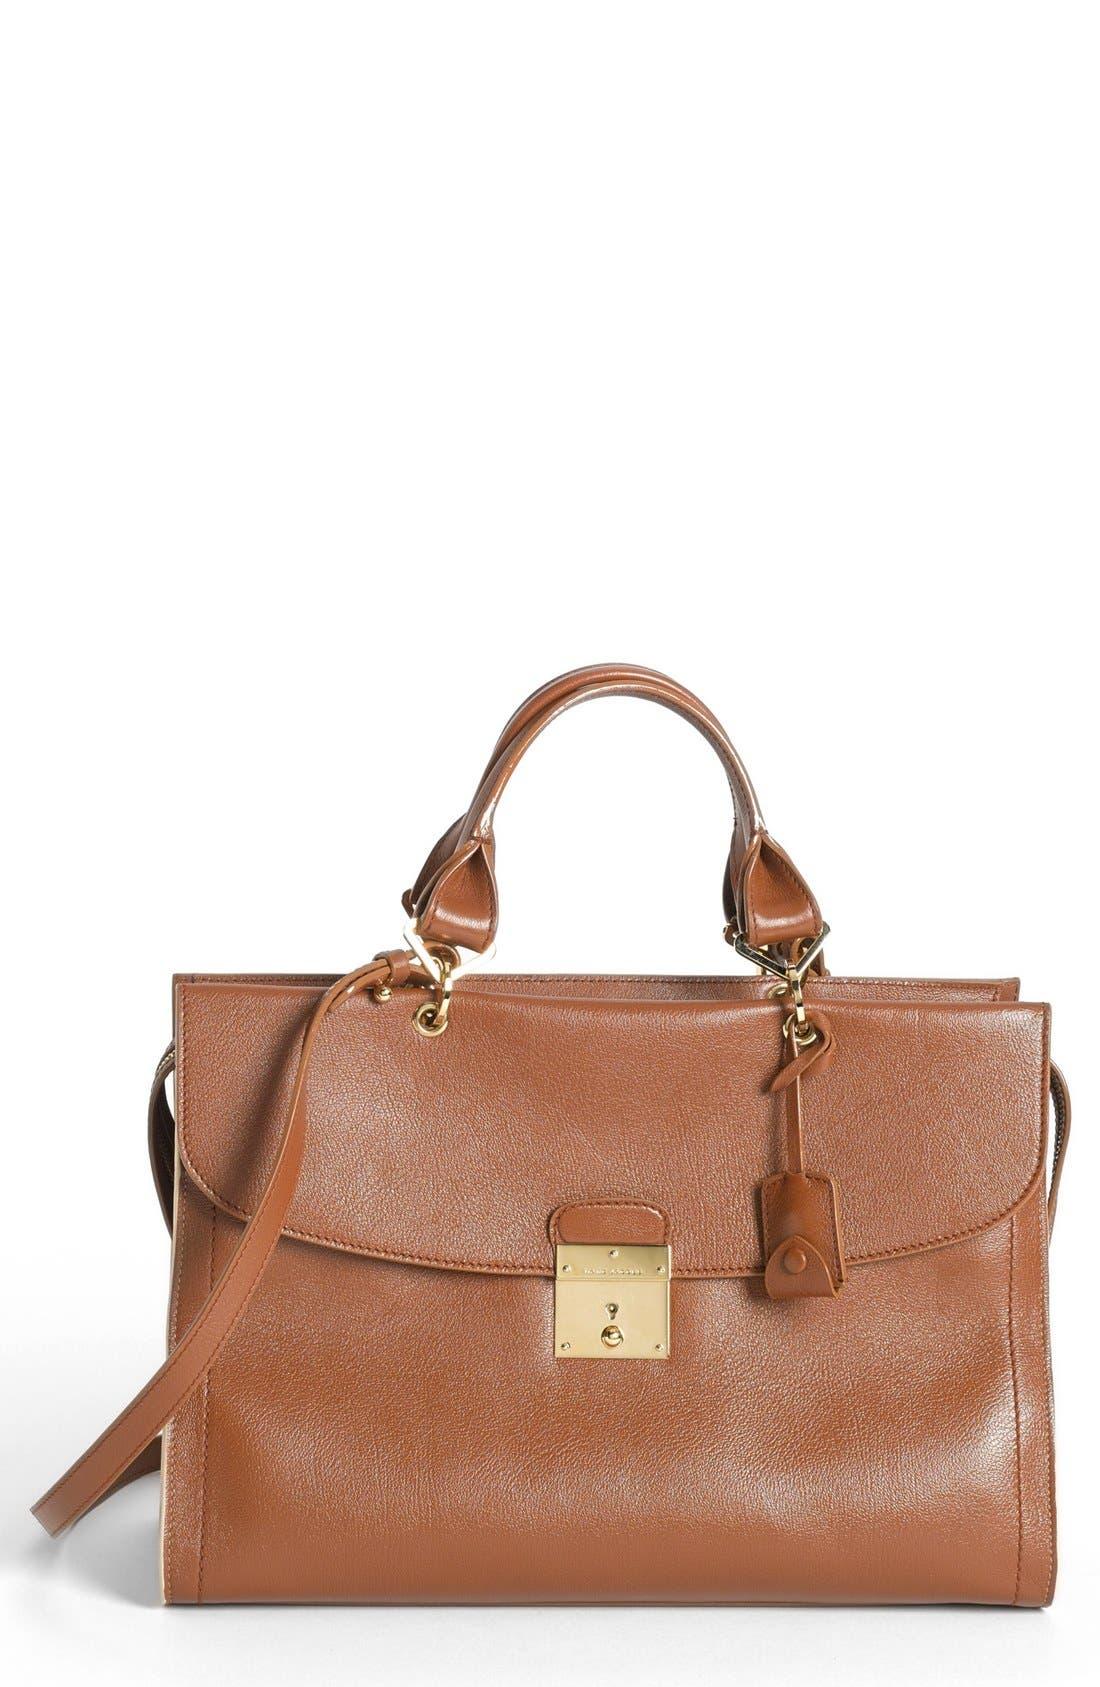 Main Image - MARC JACOBS '54' Leather Satchel